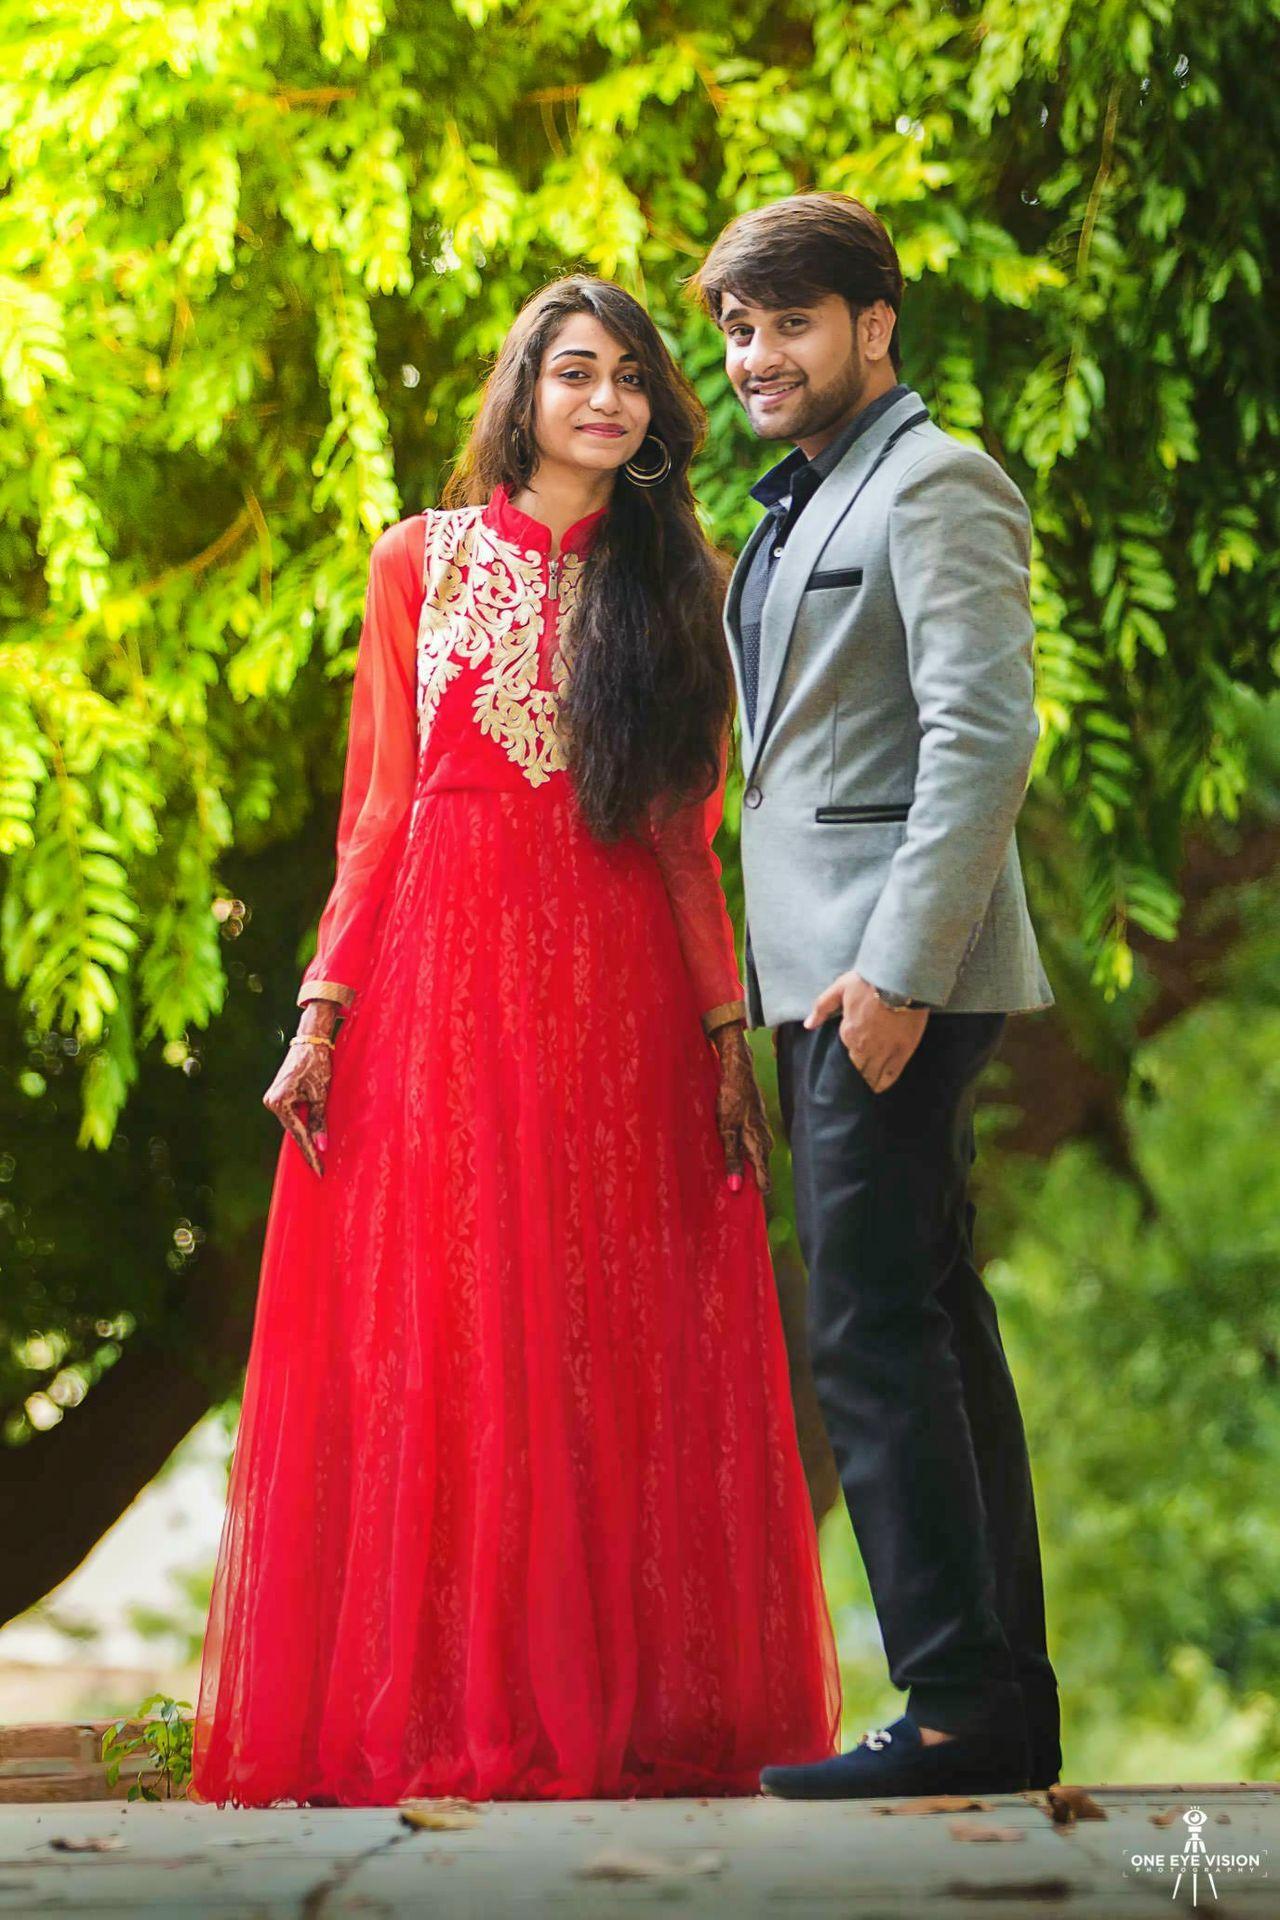 2015-meet-and-maitri-engagement-shoot-one-eye-vision-pre-wedding-photography-couple-shoot-wedding-portraits-engagement-shoot-pre-wedding-photos-indian-pre-wedding-photo (2)